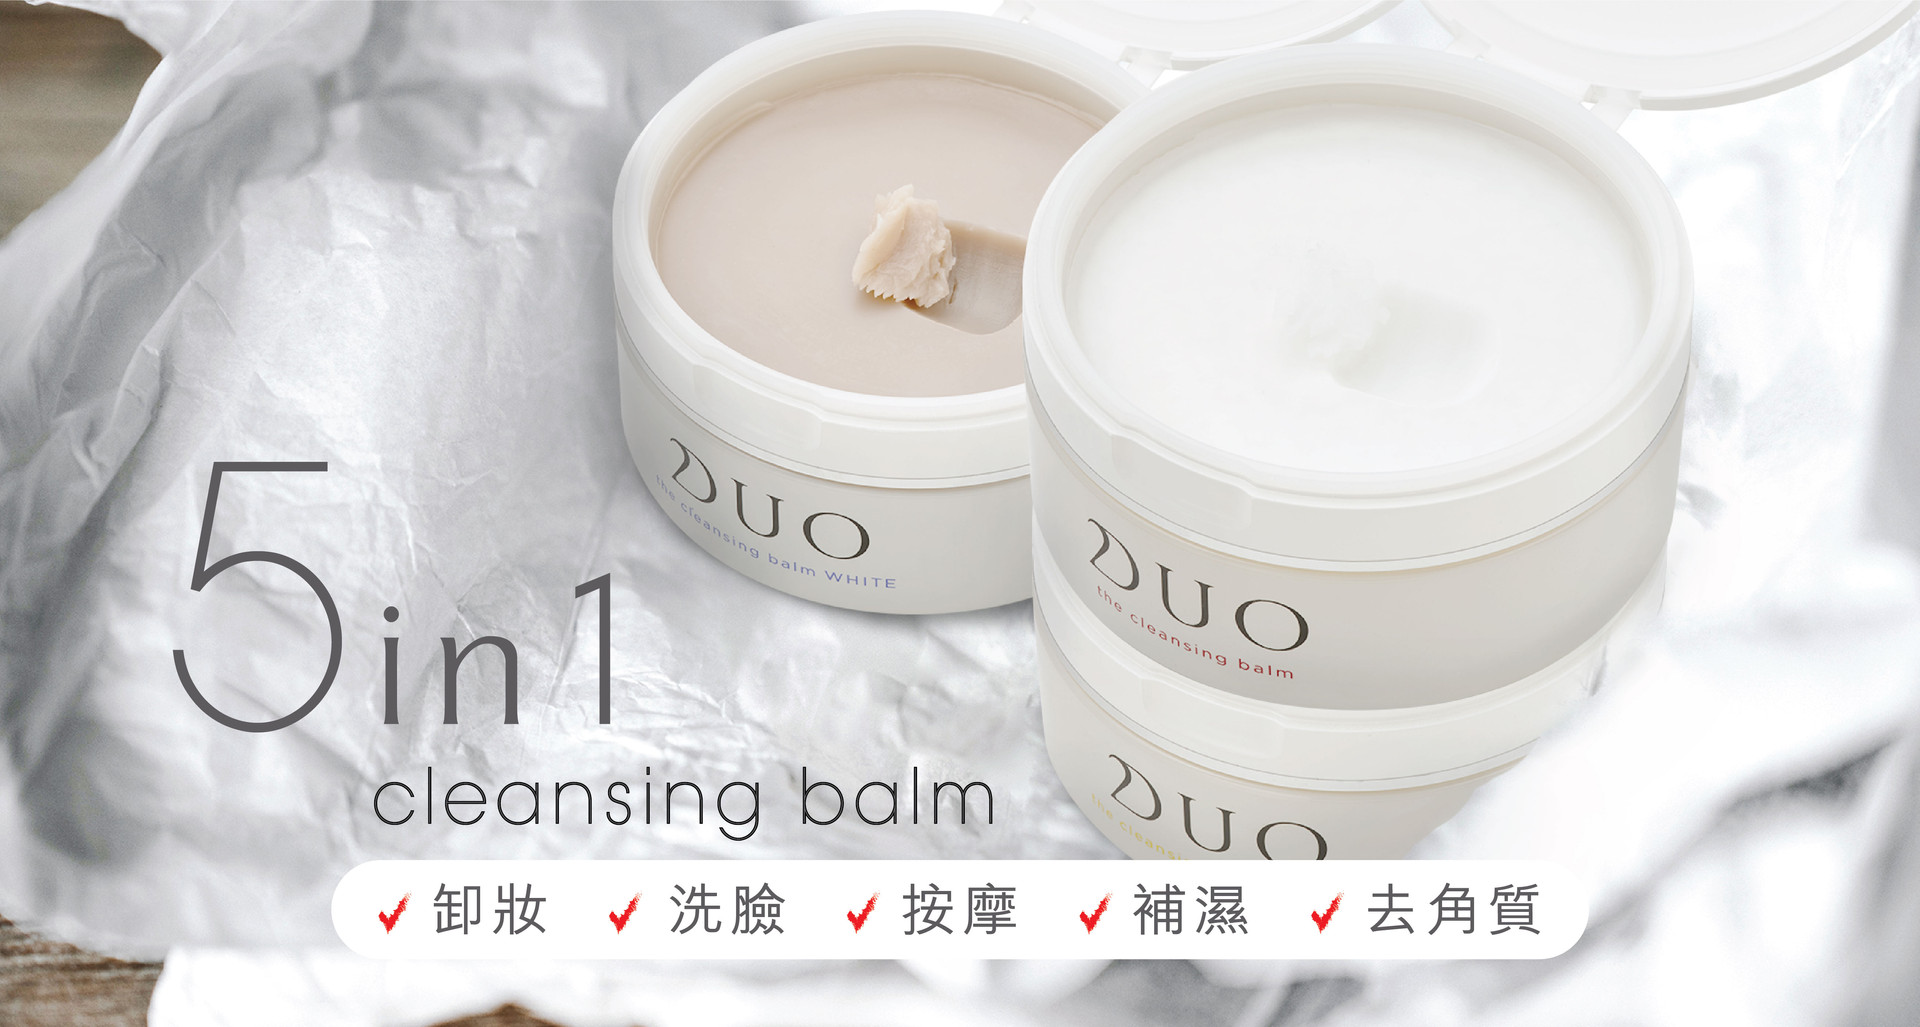 DUO-- 2020-0417-website product info-01.